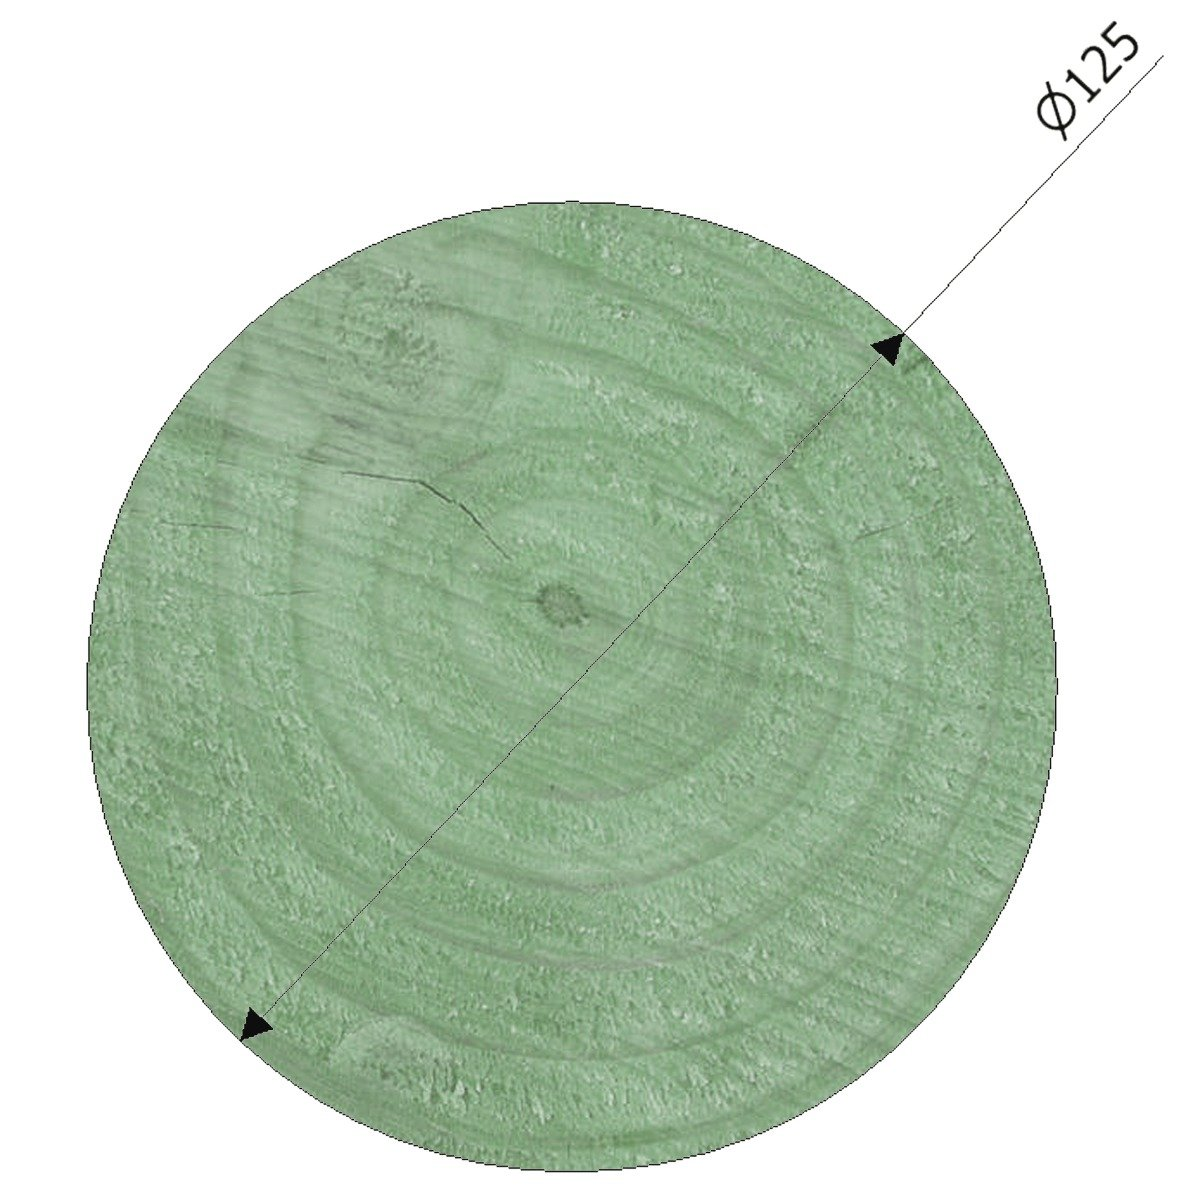 125mm Diameter Pressure Treated Radiata Pine Poles Suitable For Building And Maintaining Playground Equipment